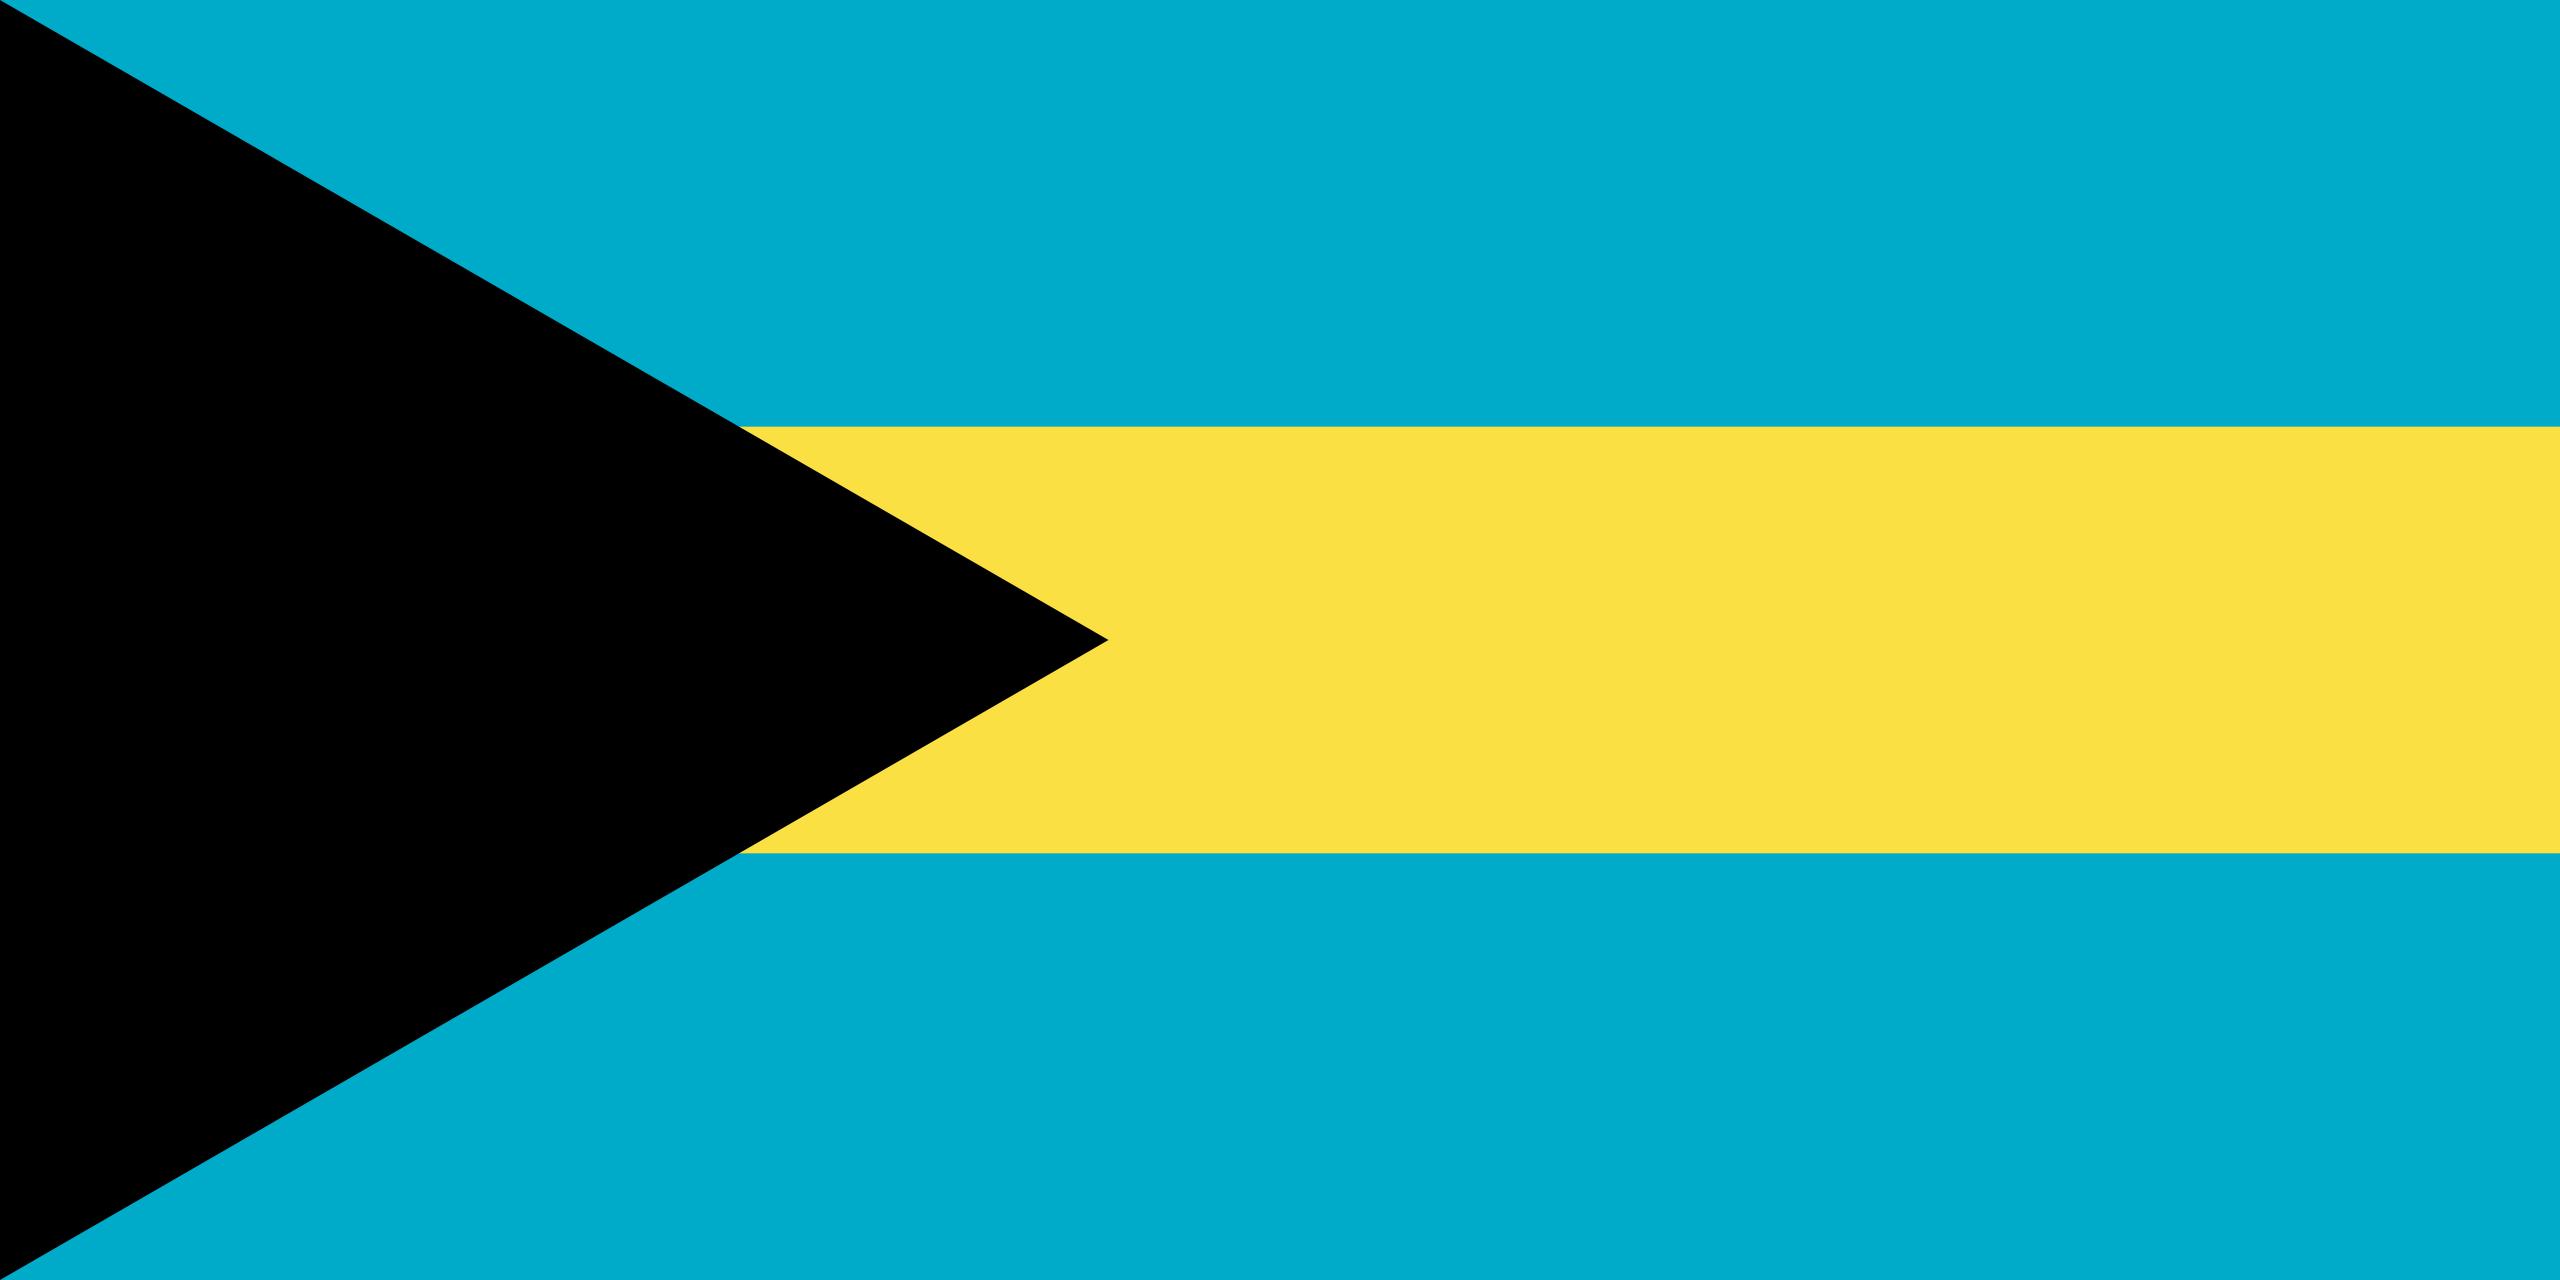 bahamas, país, emblema, insignia, प्रतीक - HD वॉलपेपर - प्रोफेसर-falken.com